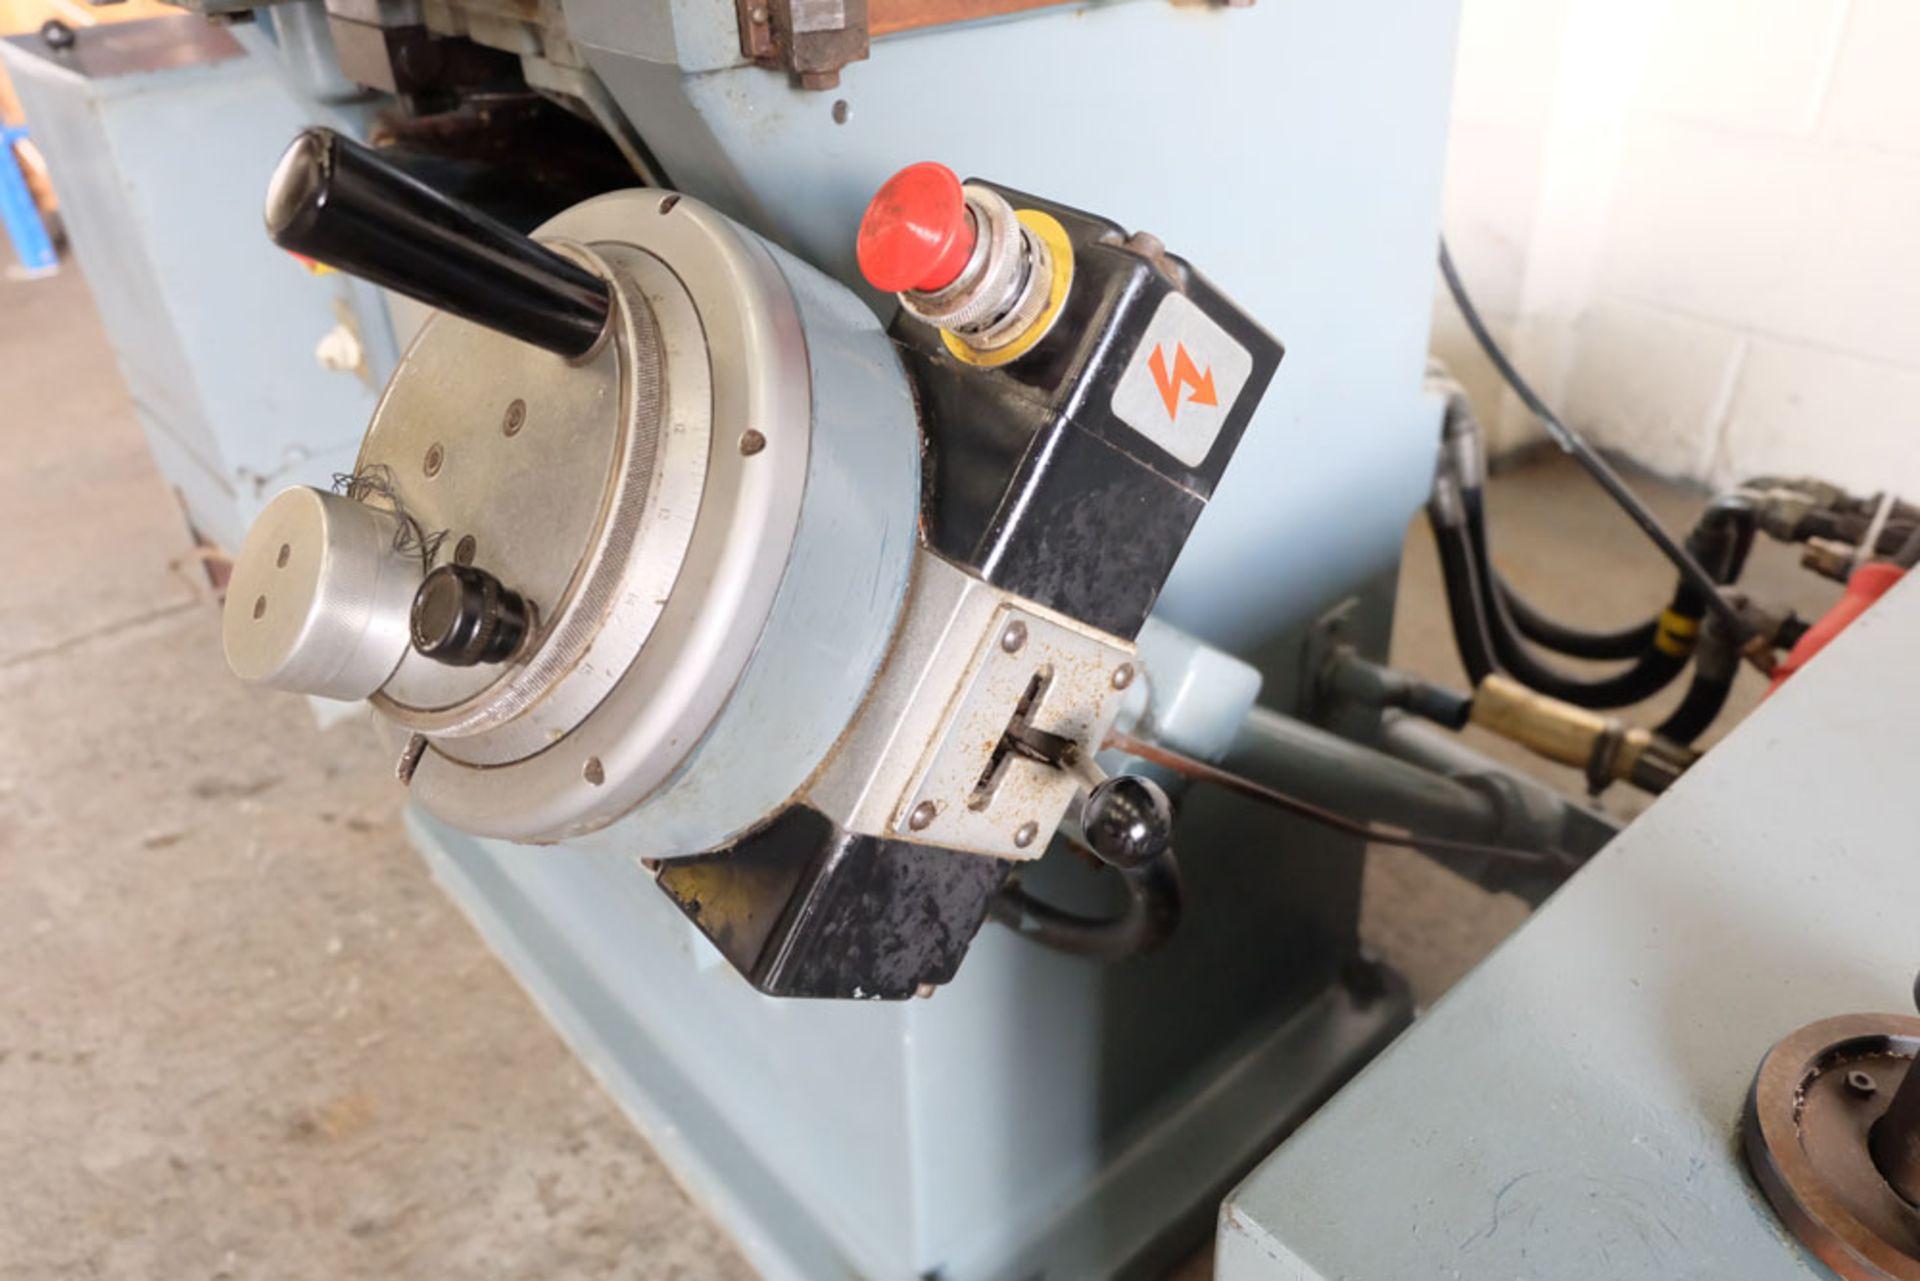 Jones & Shipman 1400P Toolroom Surface Grinder. - Image 7 of 13